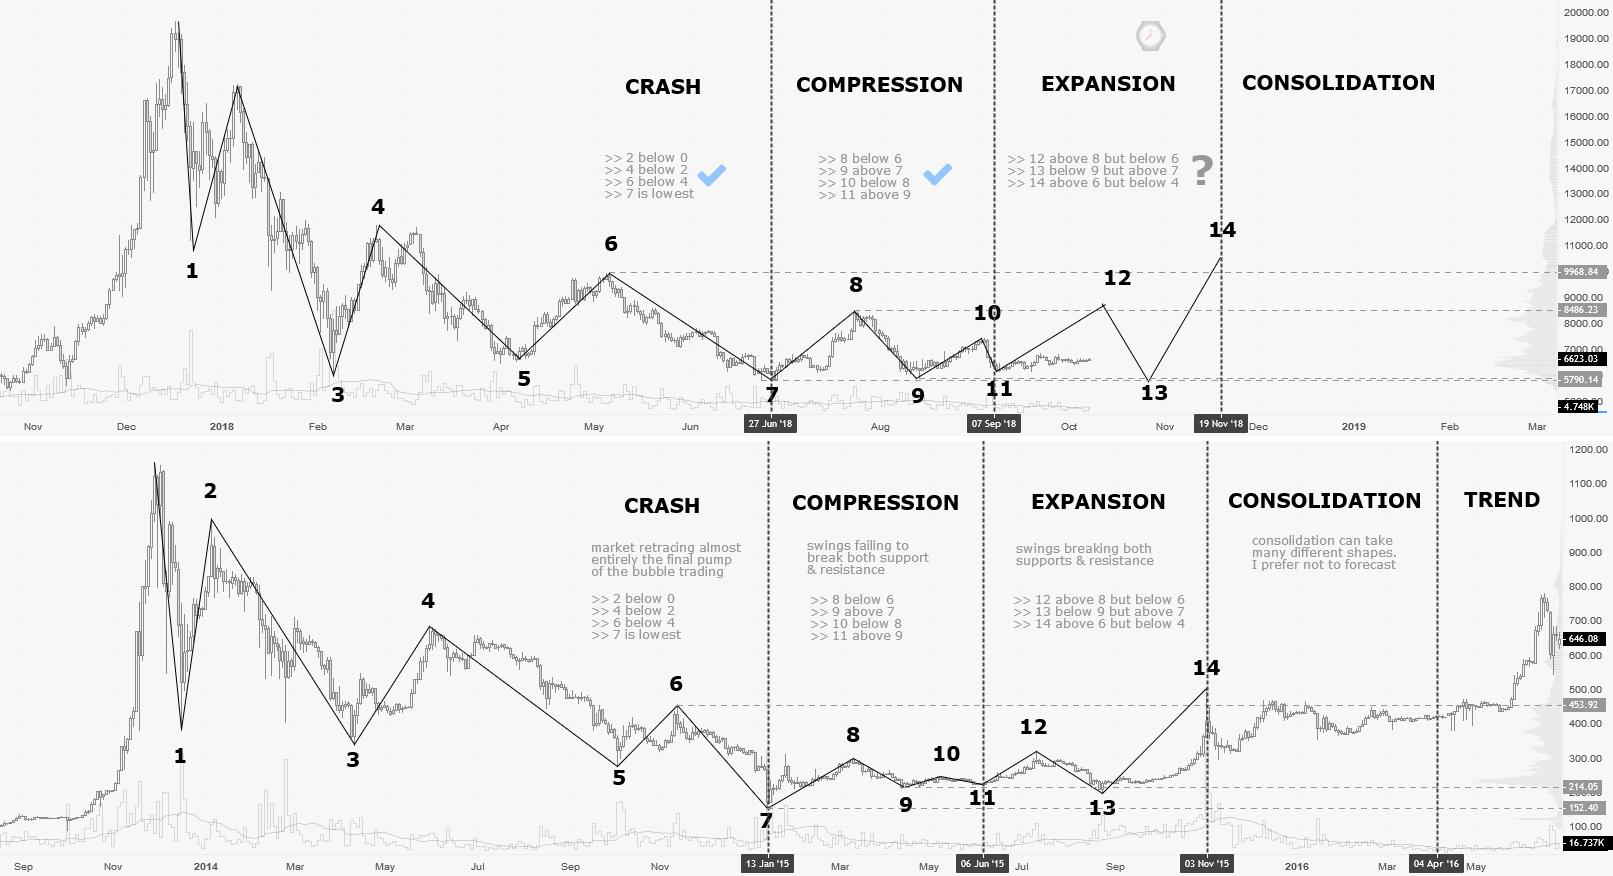 2014 crash comparison (final stage) : the compression & entry